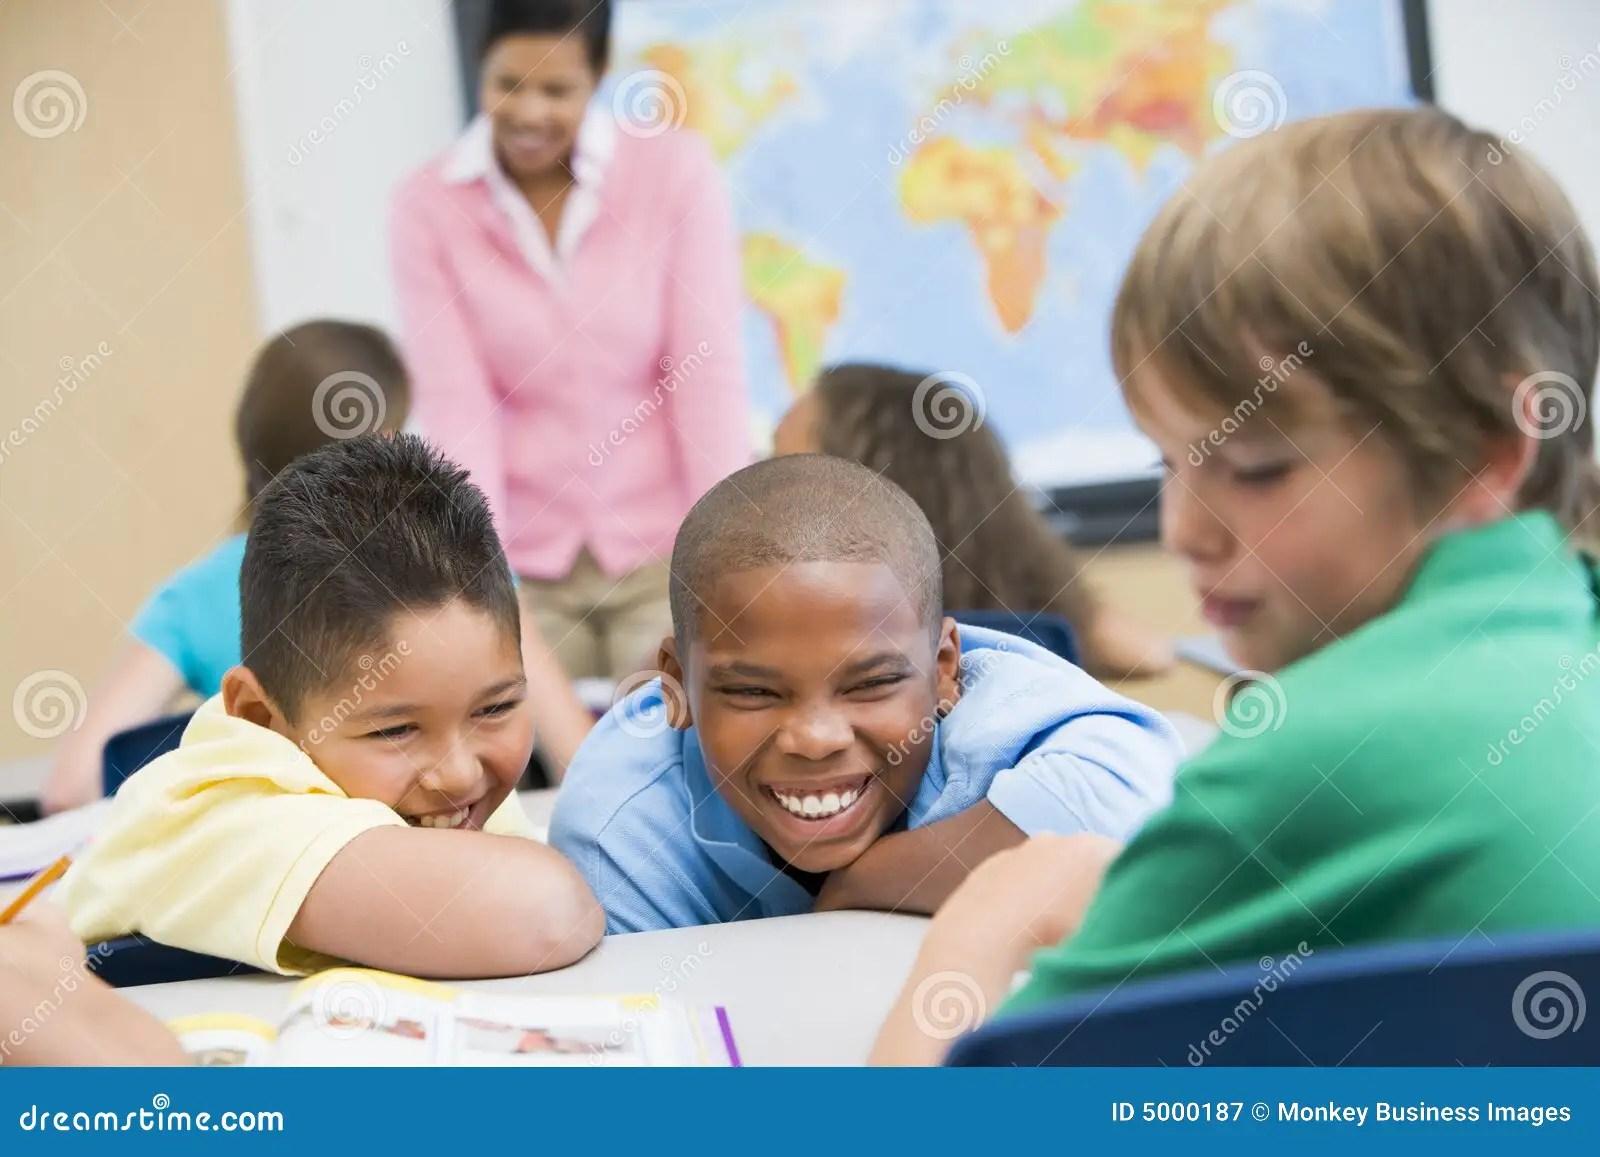 Bullying In Elementary School Royalty Free Stock